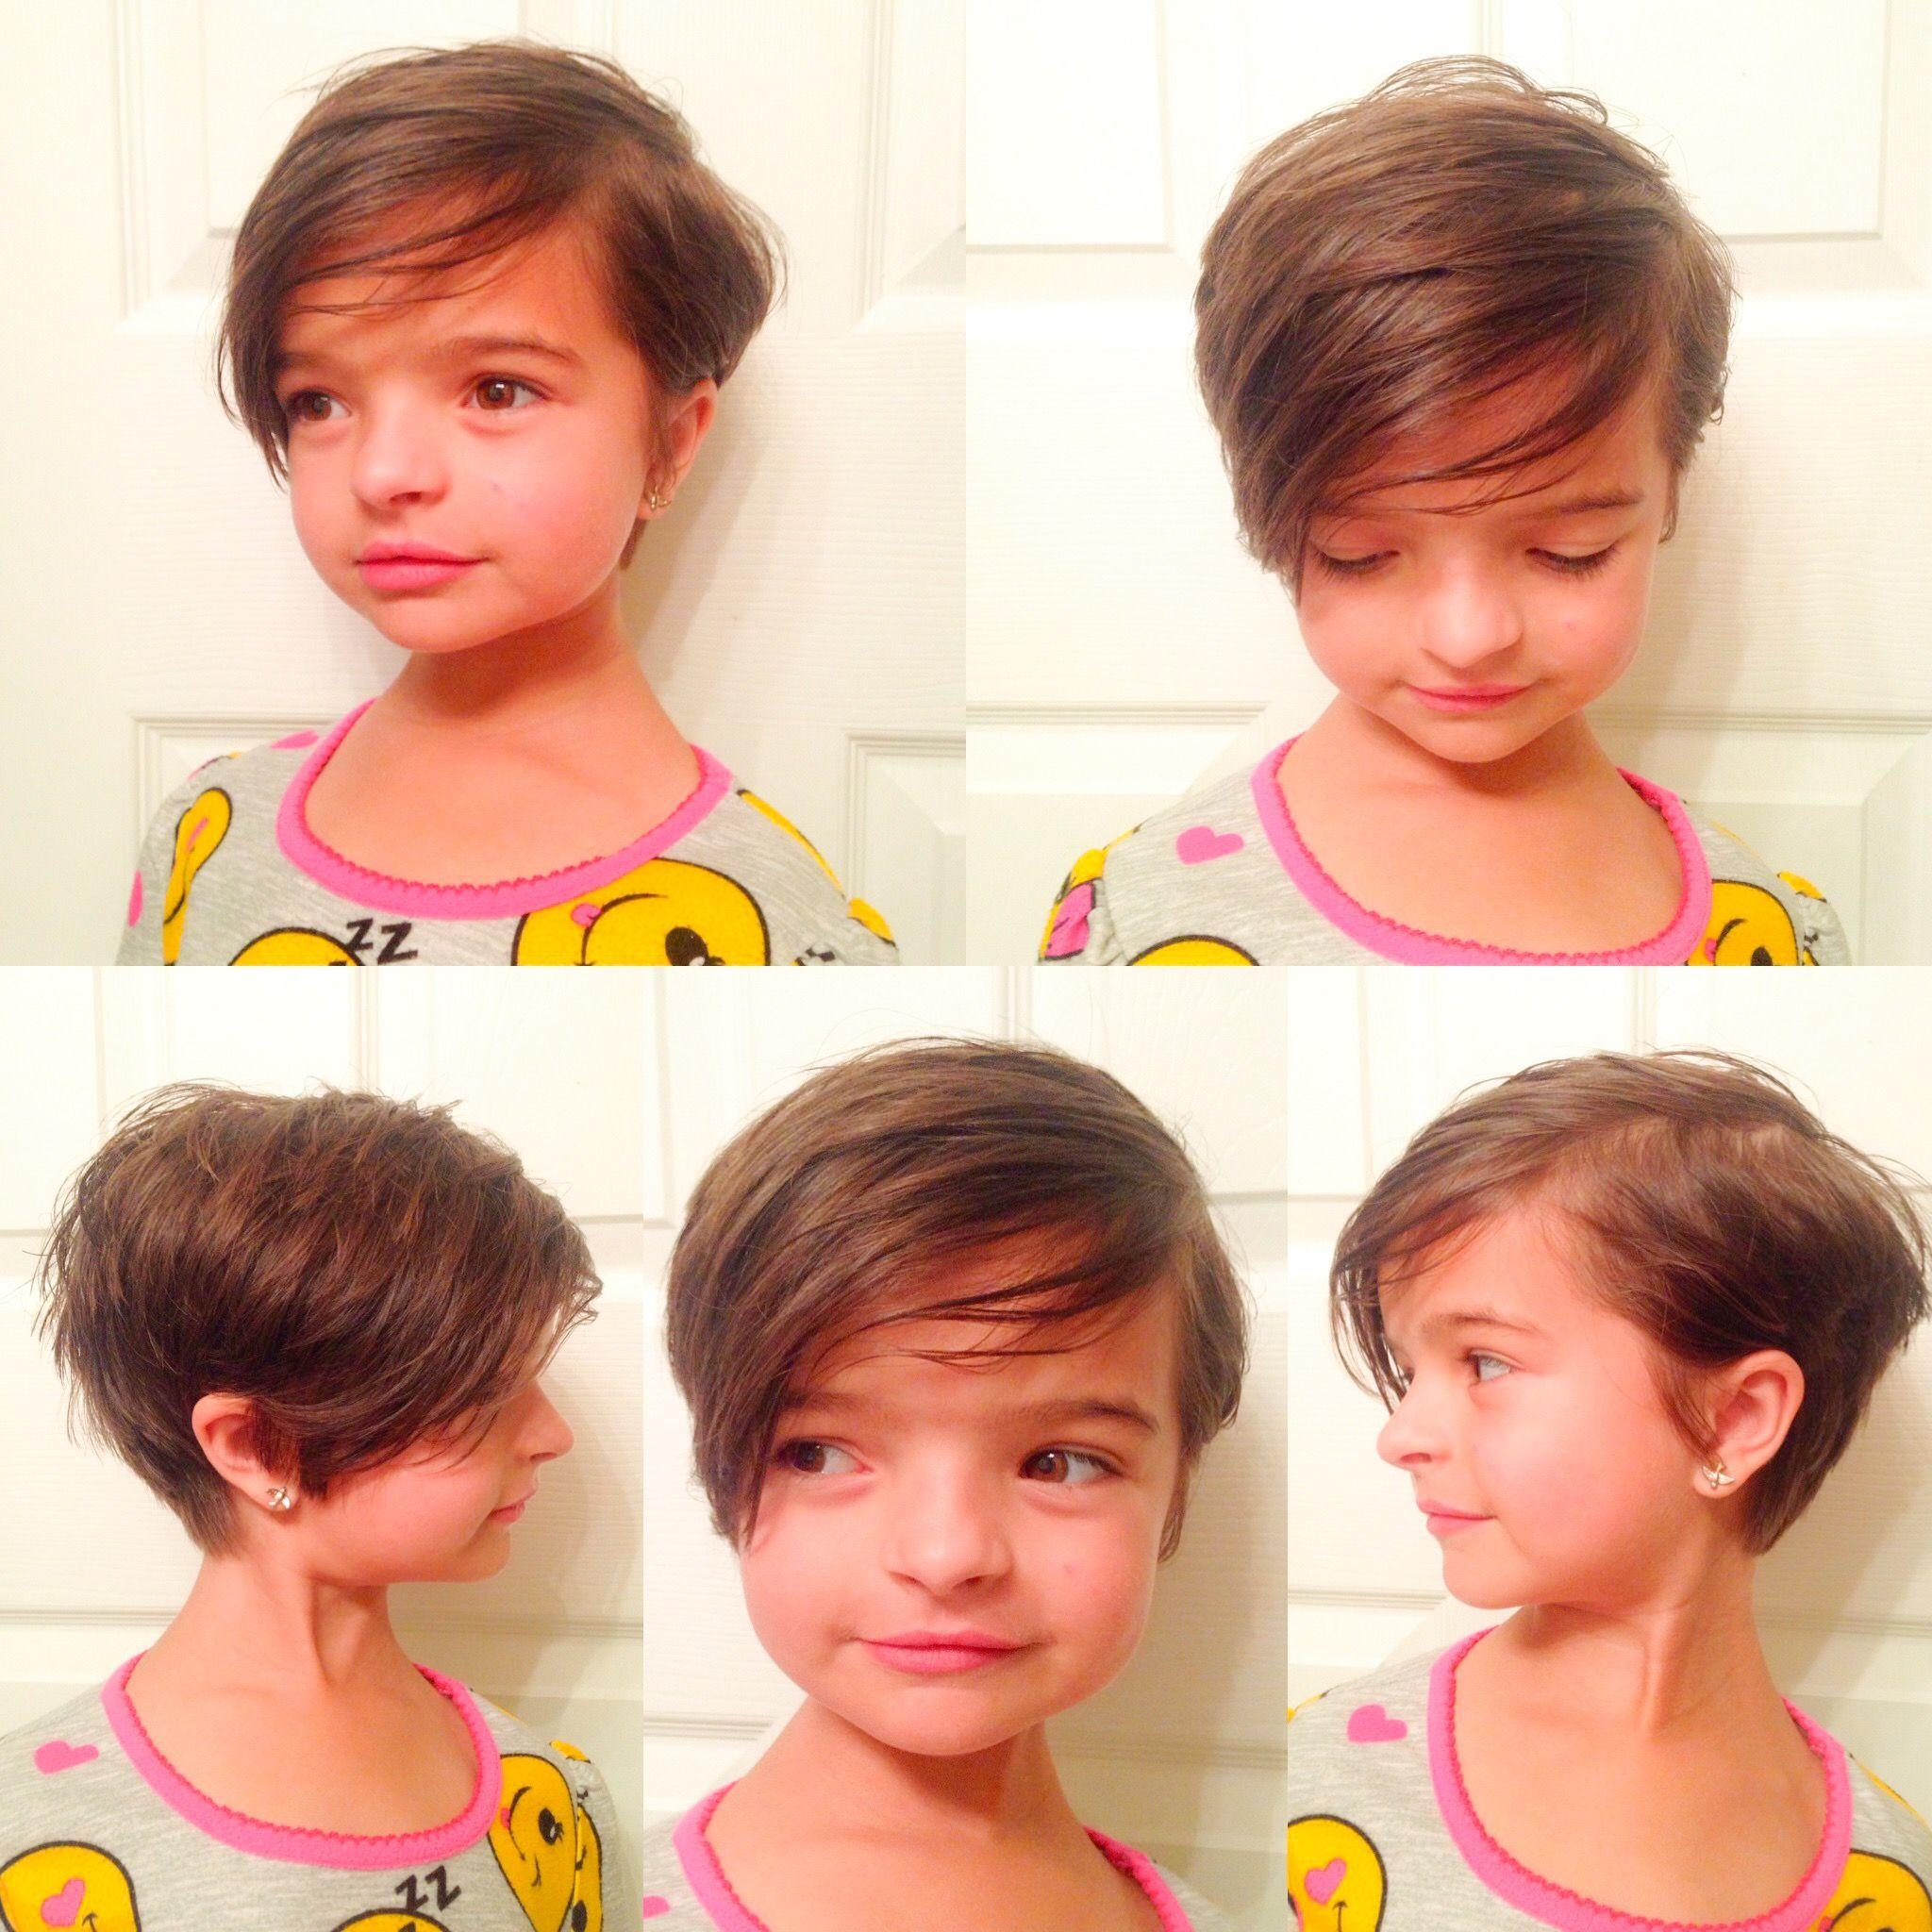 little girl's haircut, little girl's hairstyle, pixie cut